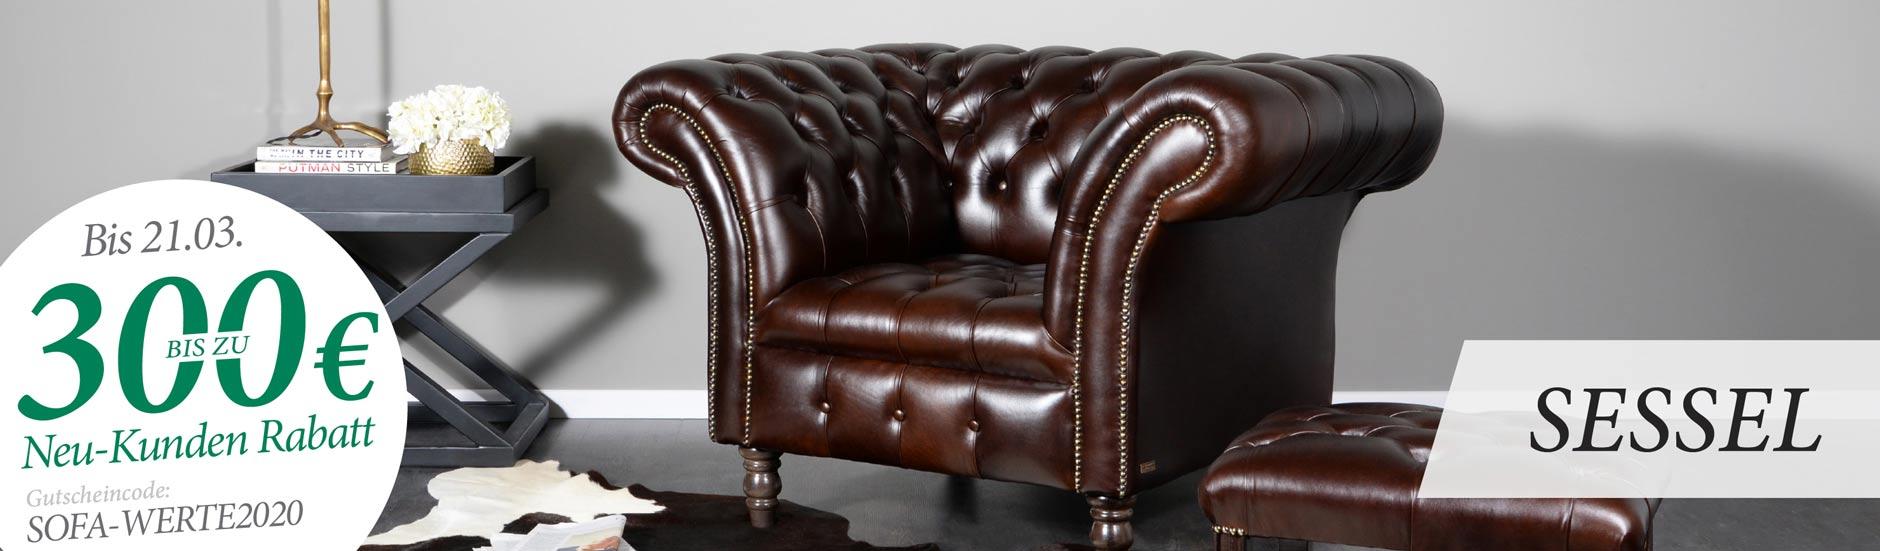 Full Size of Chesterfield Sofa Gebraucht Sessel Samt Blau Original Kaufen 2 5 Sitzer Wildleder Mit Relaxfunktion Grau Leder 3er Hocker Big Sam Landhausstil Home Affaire Sofa Chesterfield Sofa Gebraucht